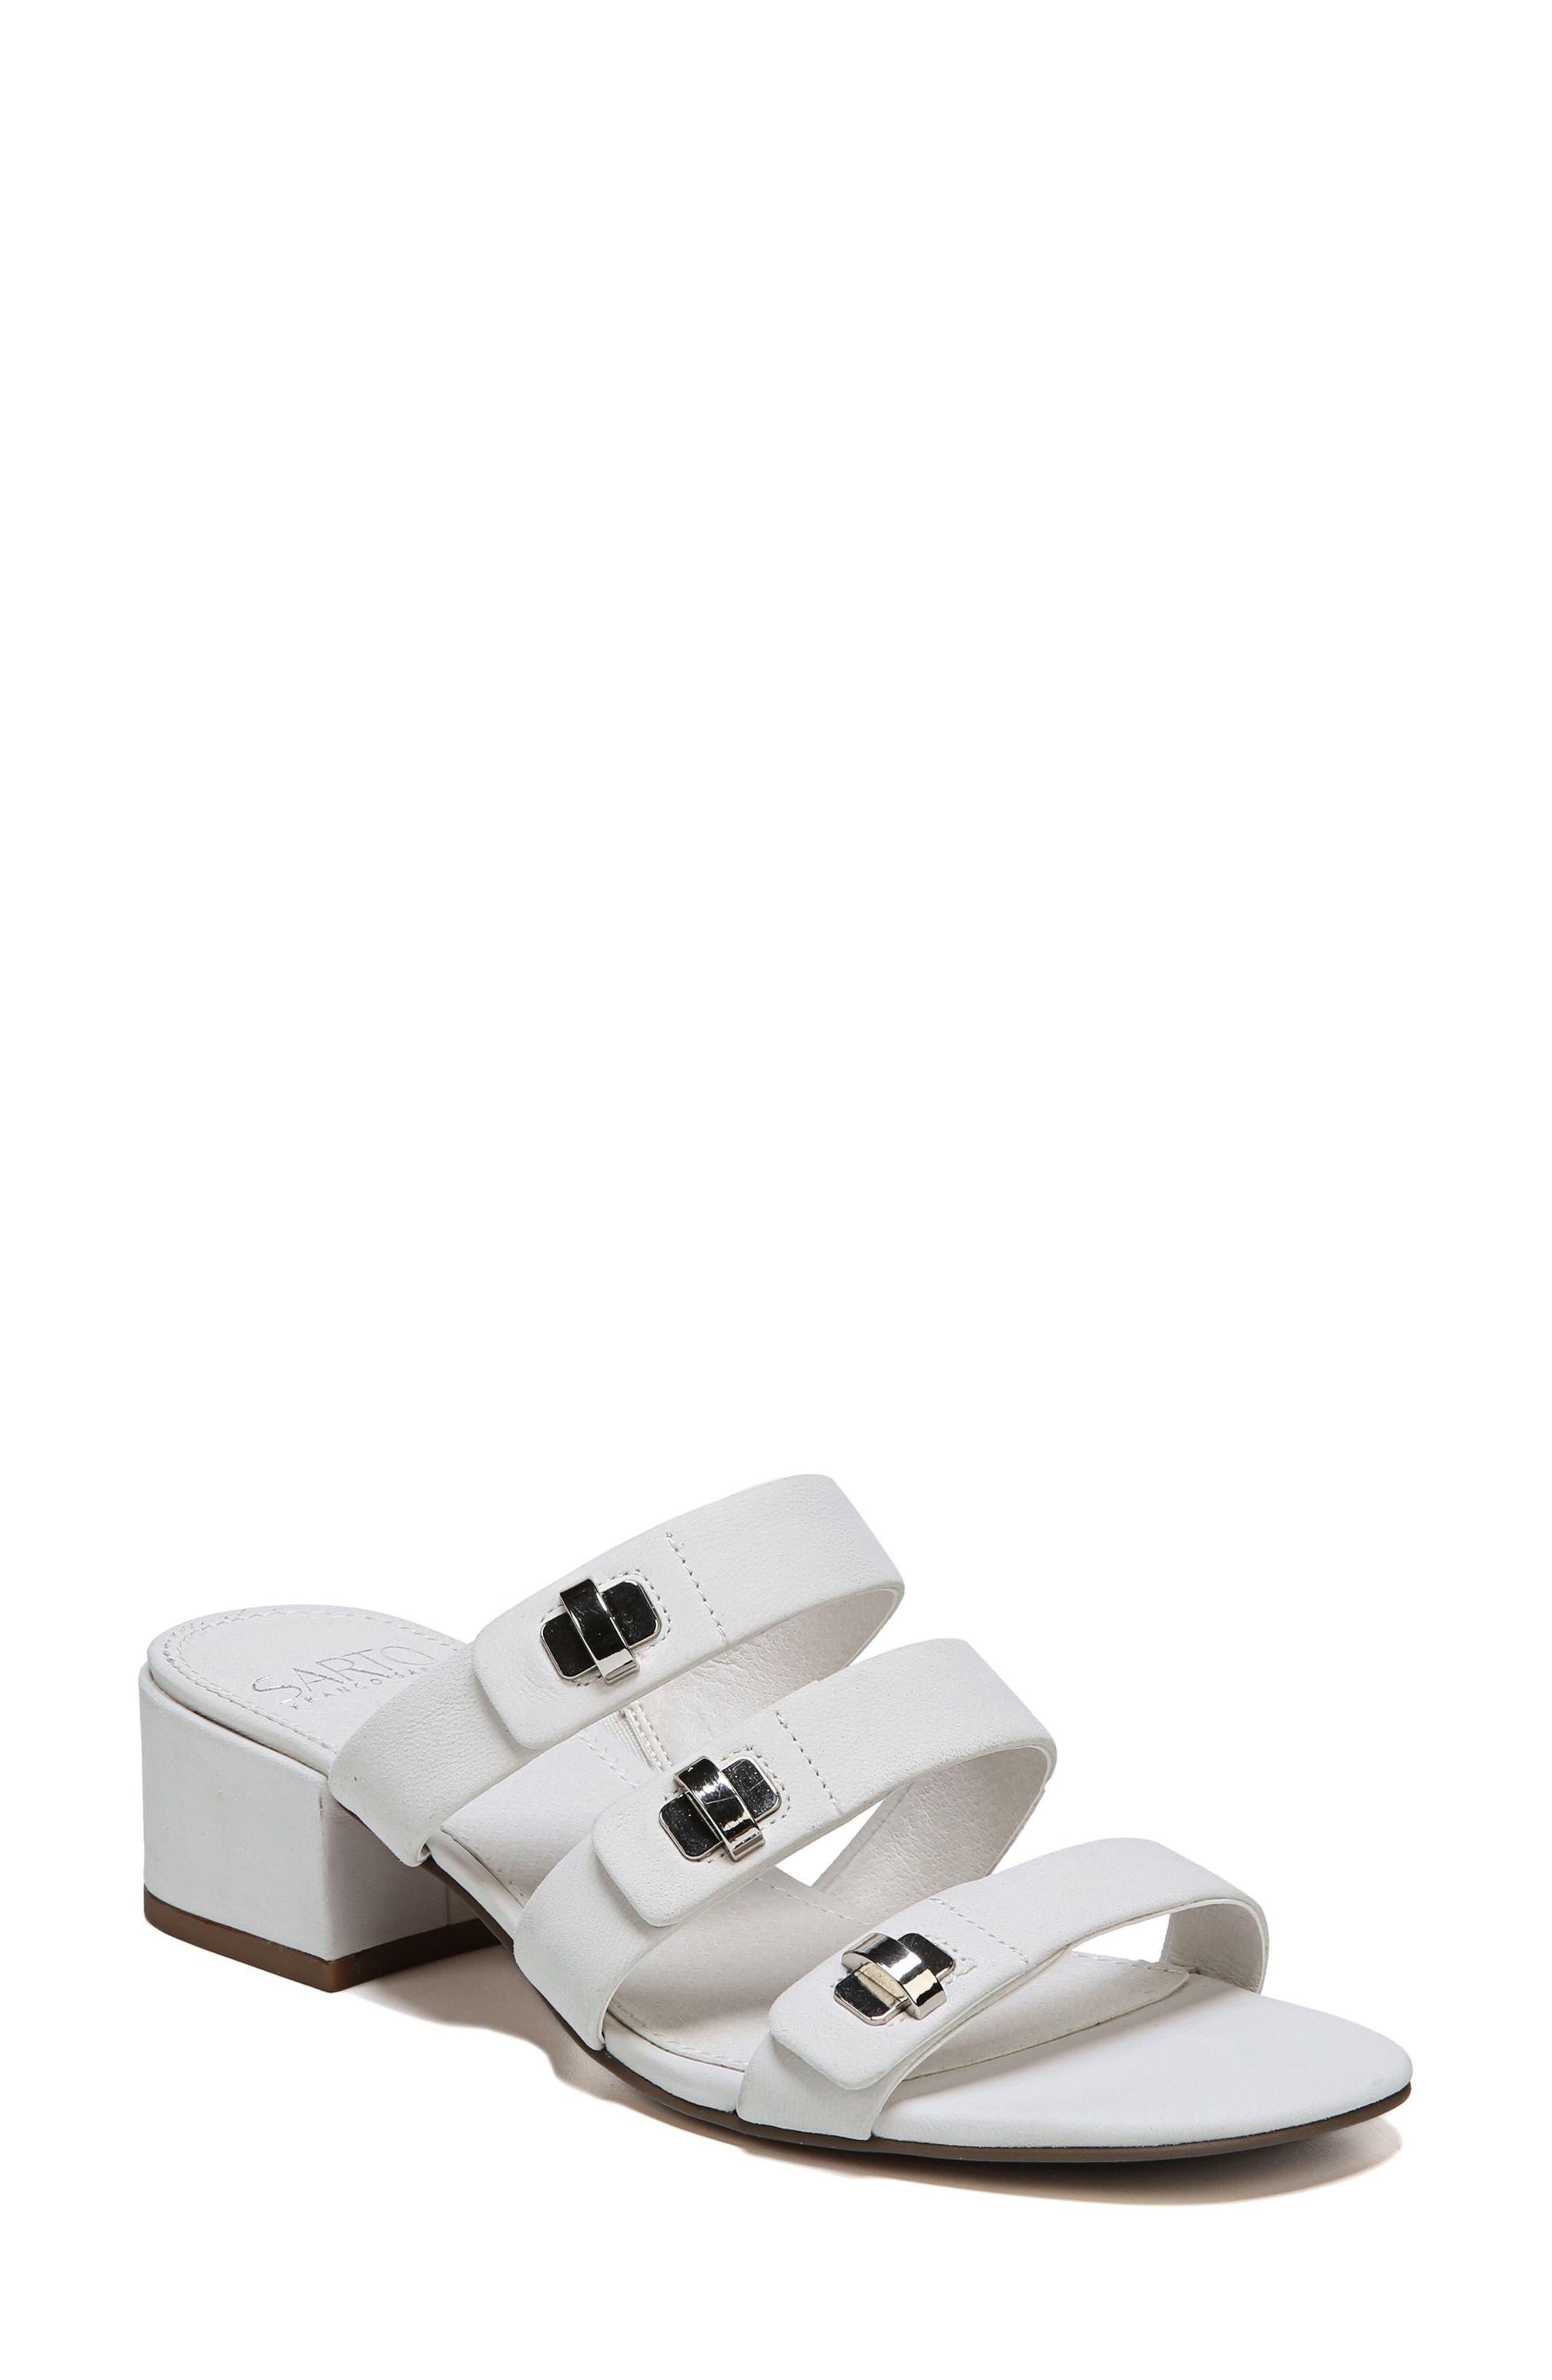 Arabesque Strappy Slide Sandal,                         Main,                         color, Blanca Nubuck